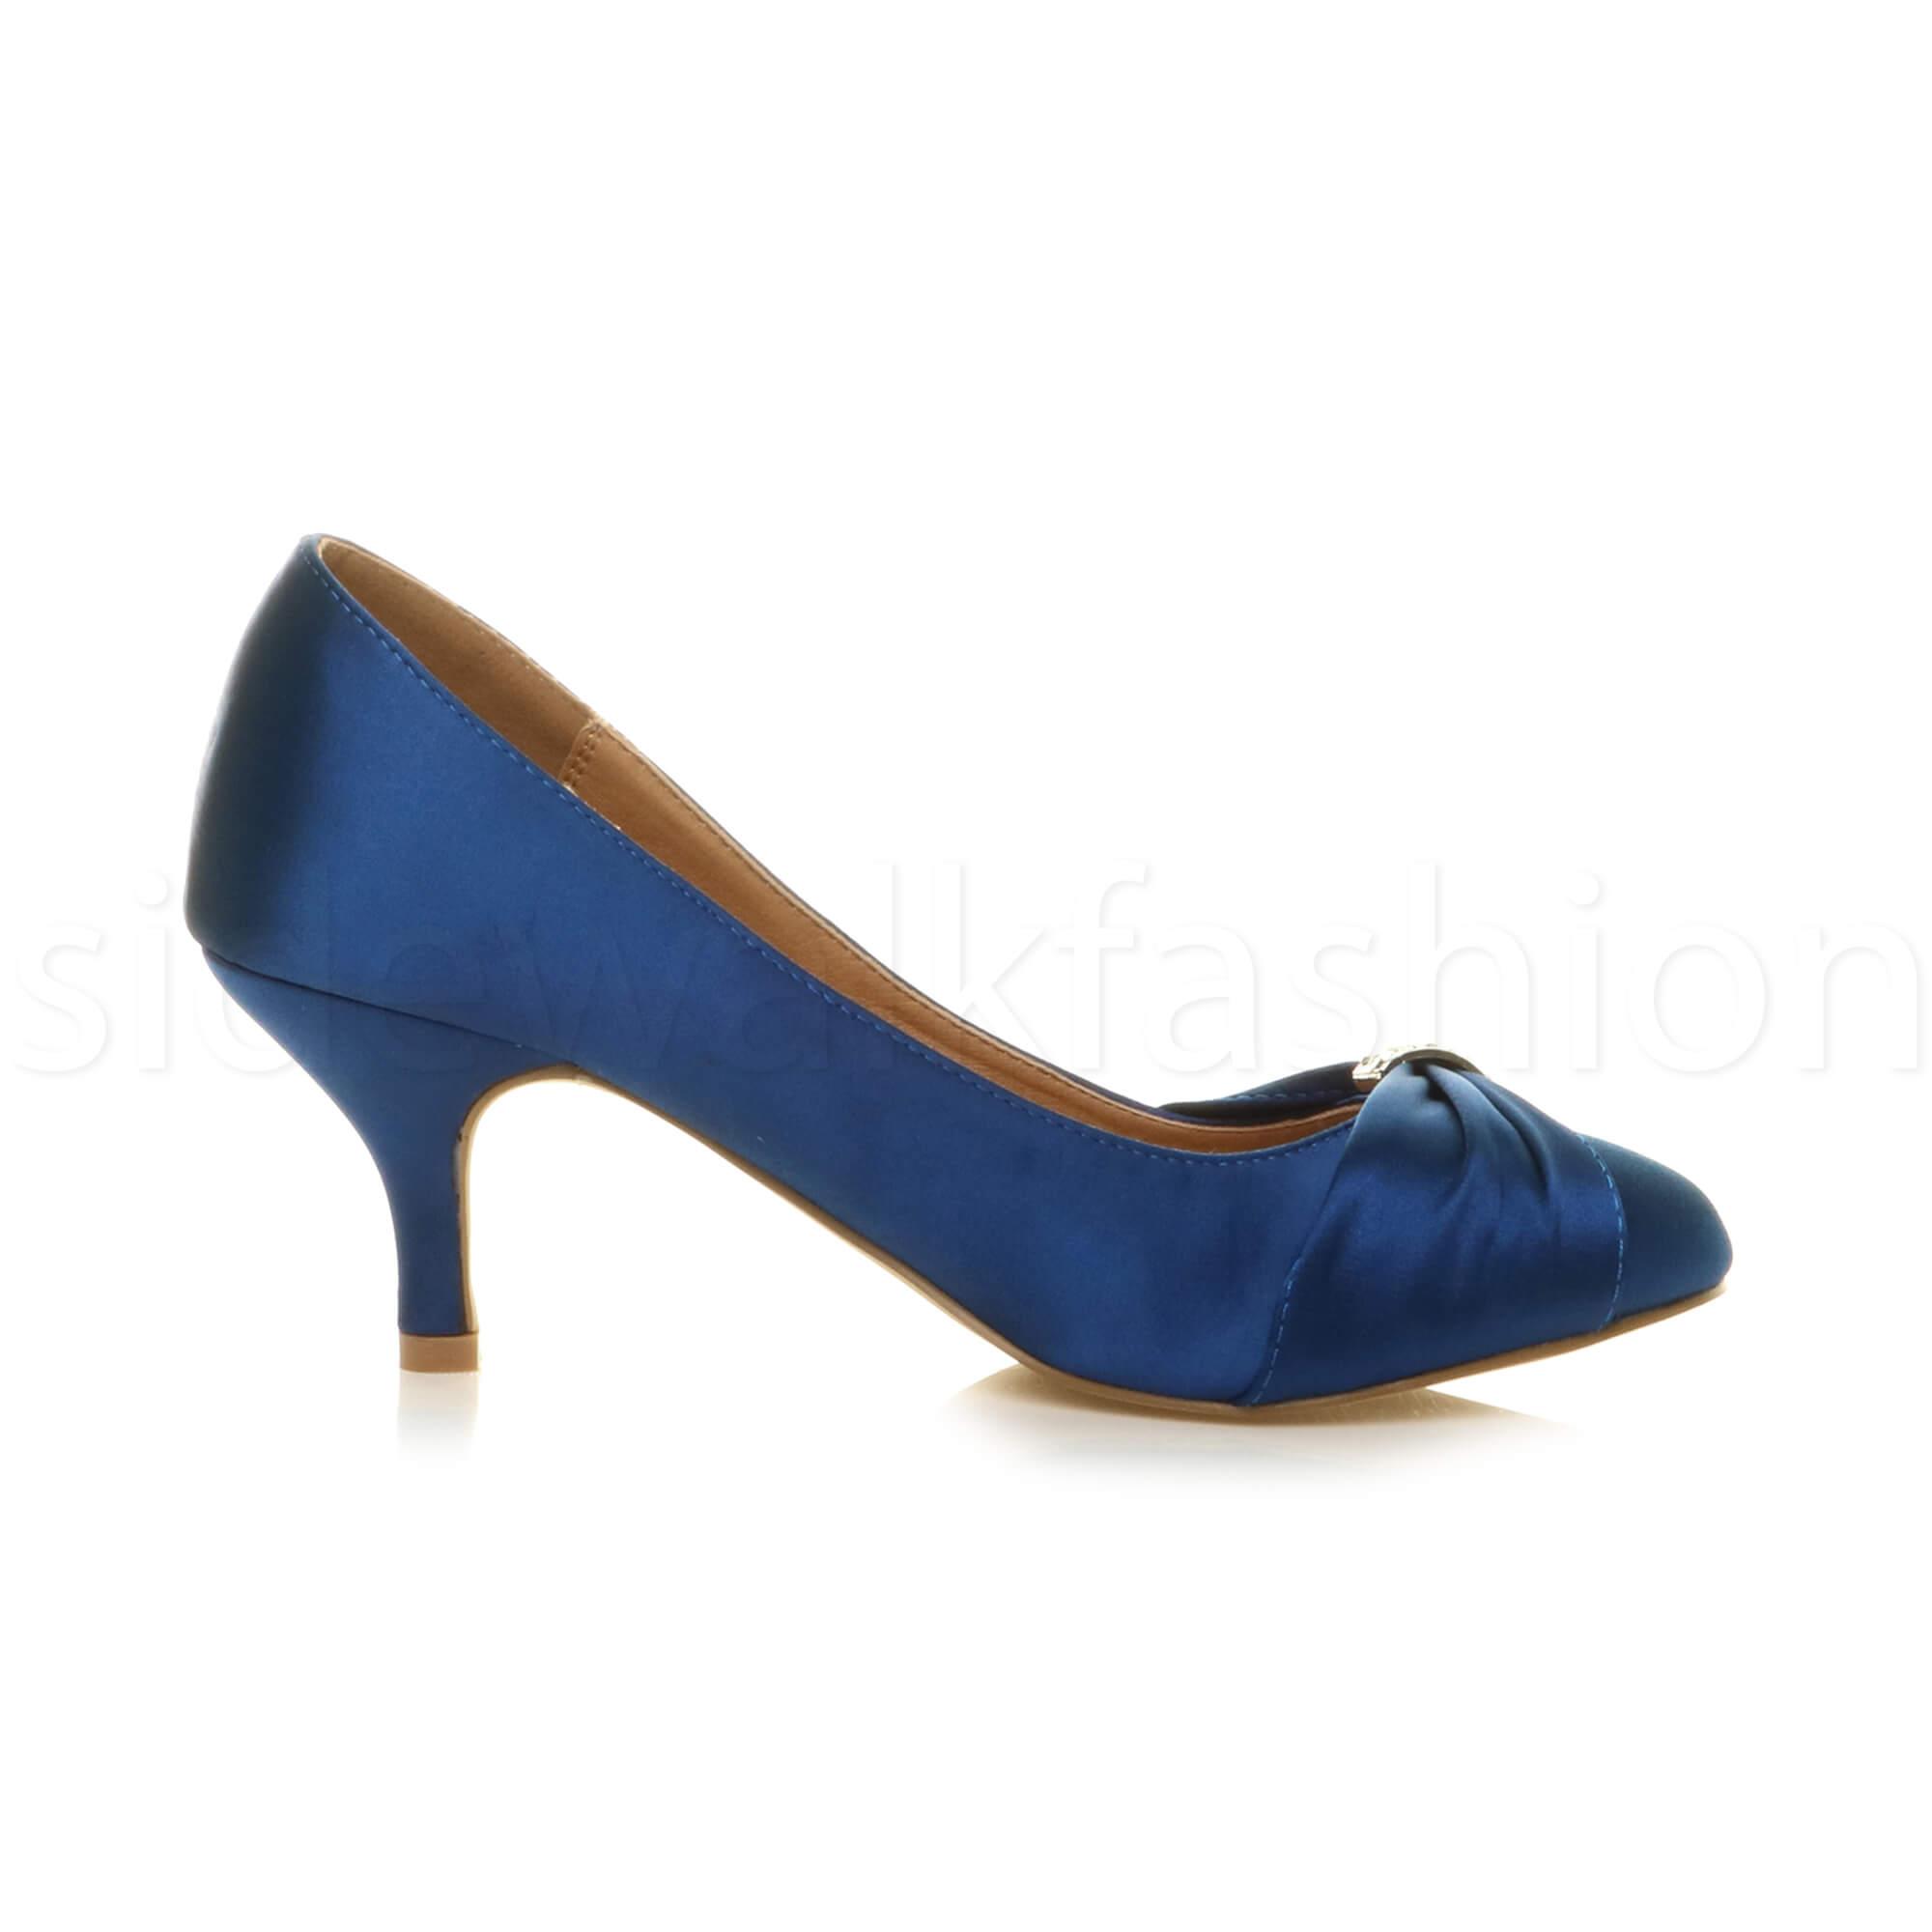 Womens-ladies-low-mid-heel-diamante-party-smart-evening-court-shoes-size thumbnail 52